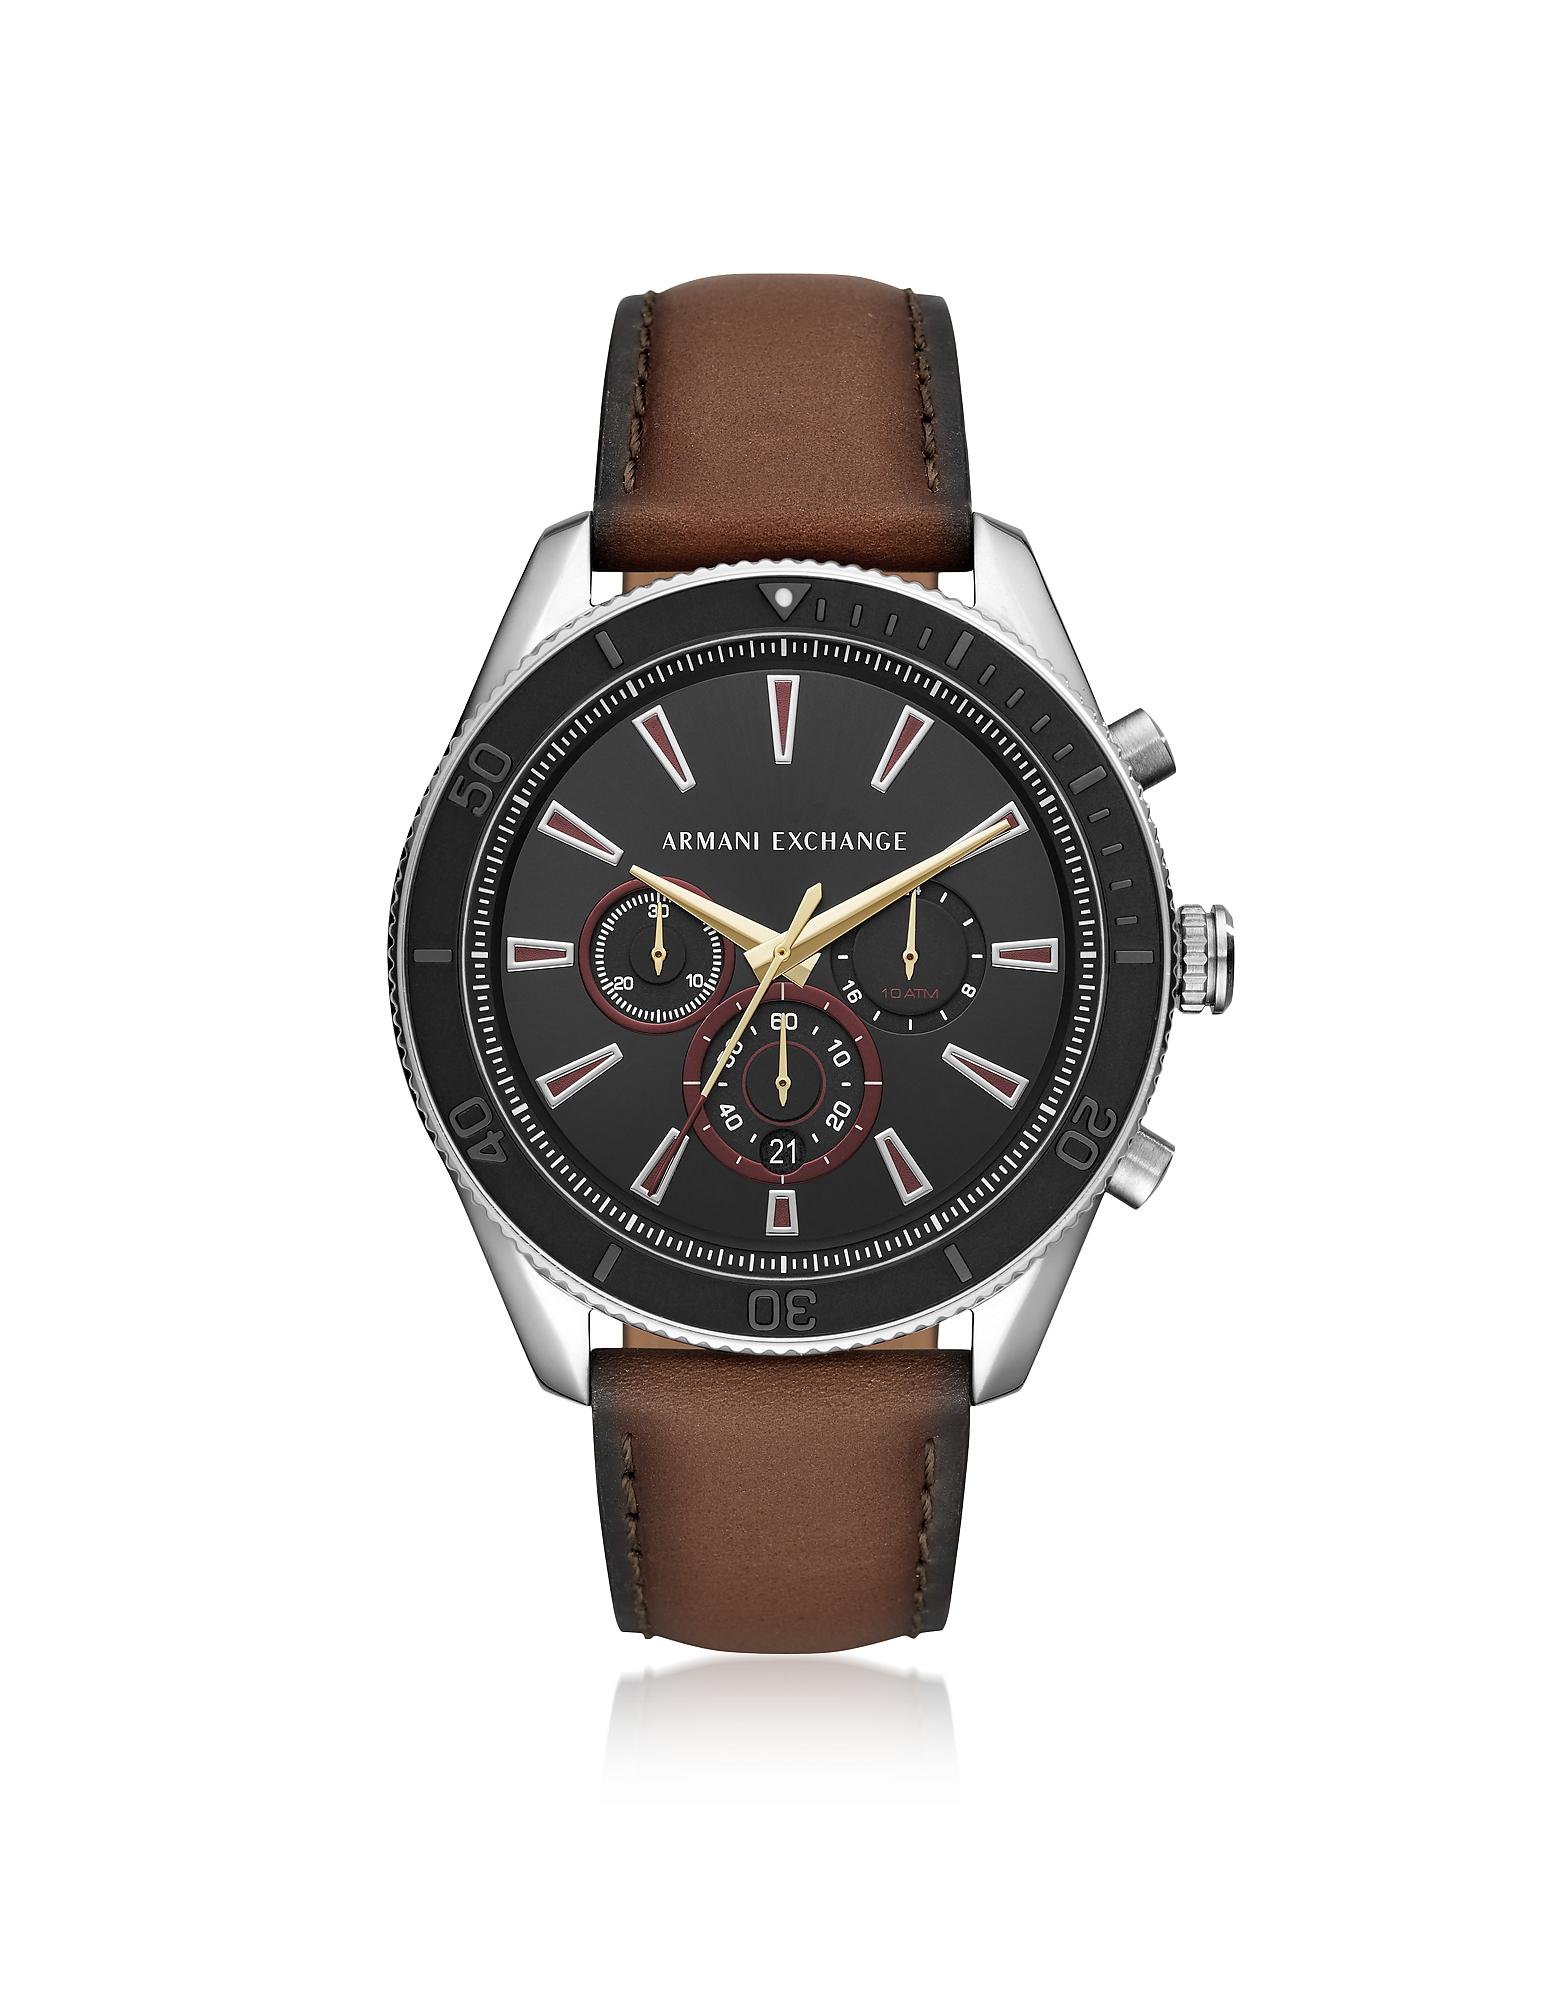 Мужские Часы AX1822 Enzo Emporio Armani